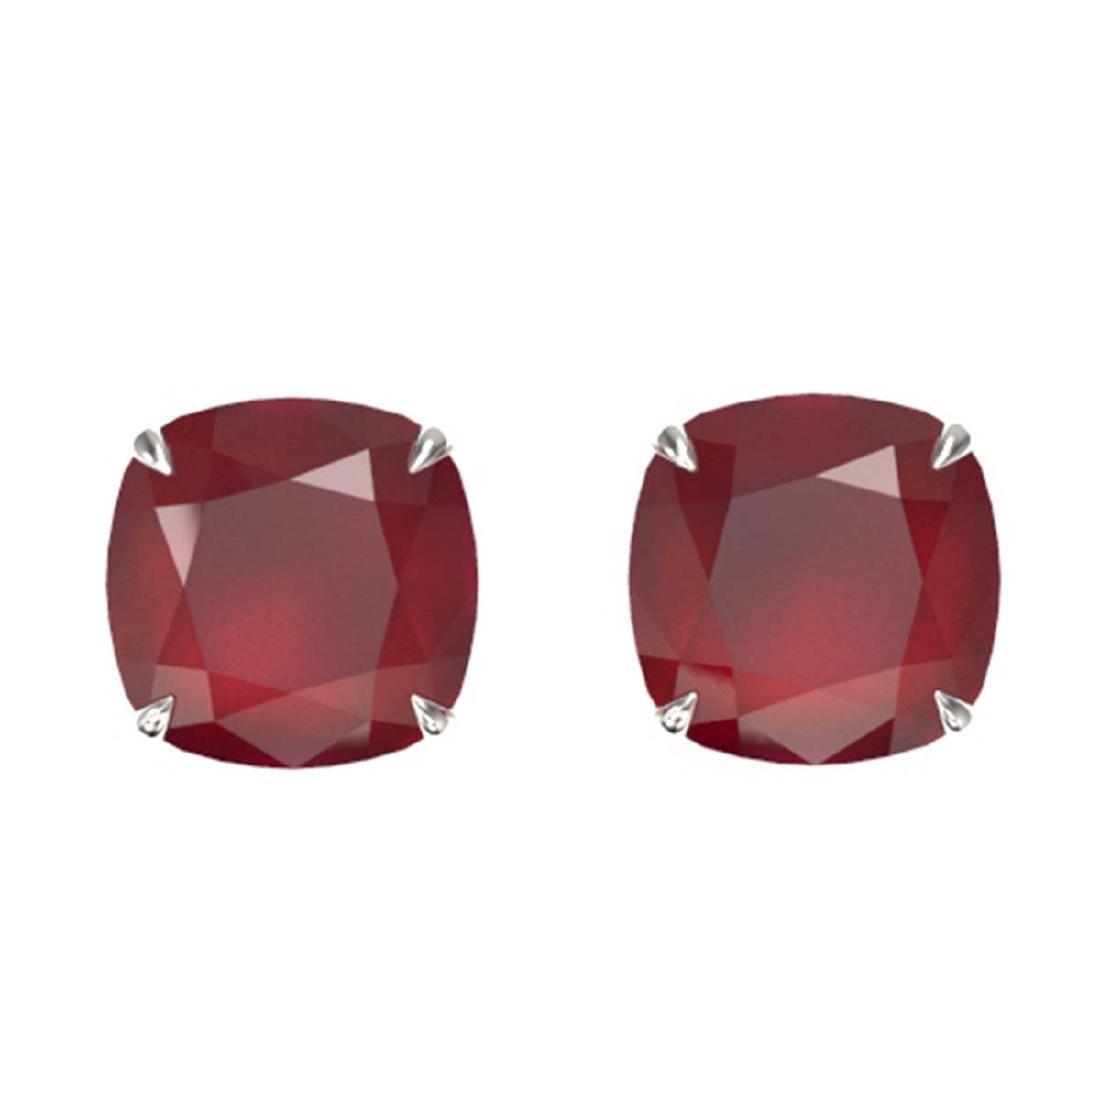 12 ctw Cushion Cut Ruby Stud Earrings 18K White Gold -